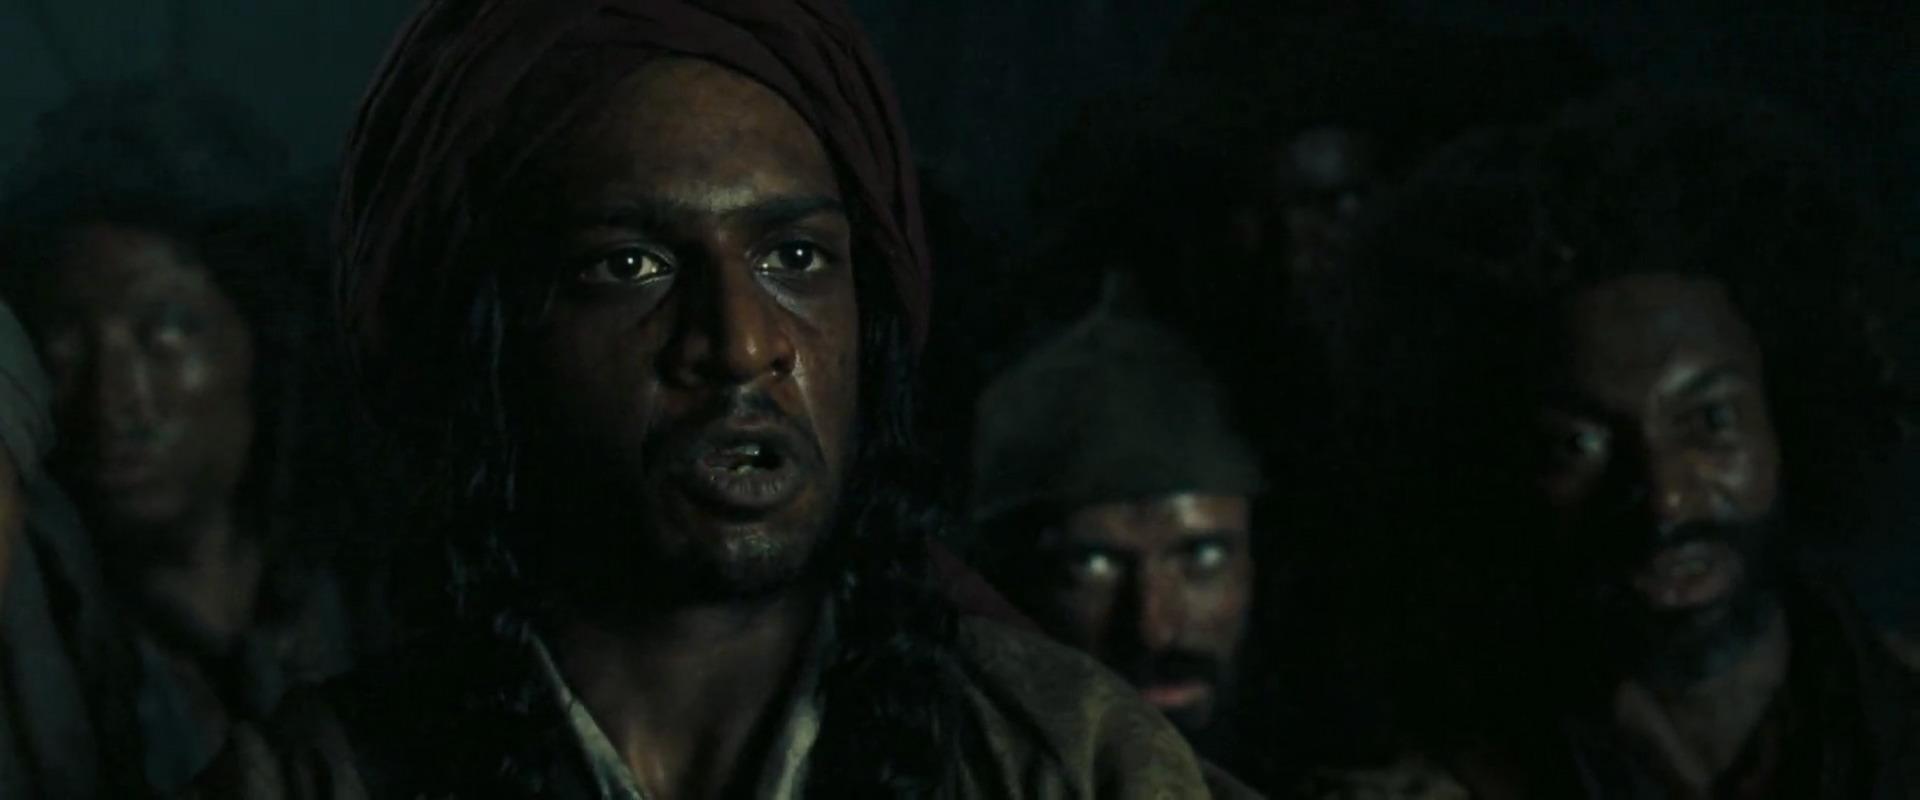 Leech (Pirates of the Caribbean)